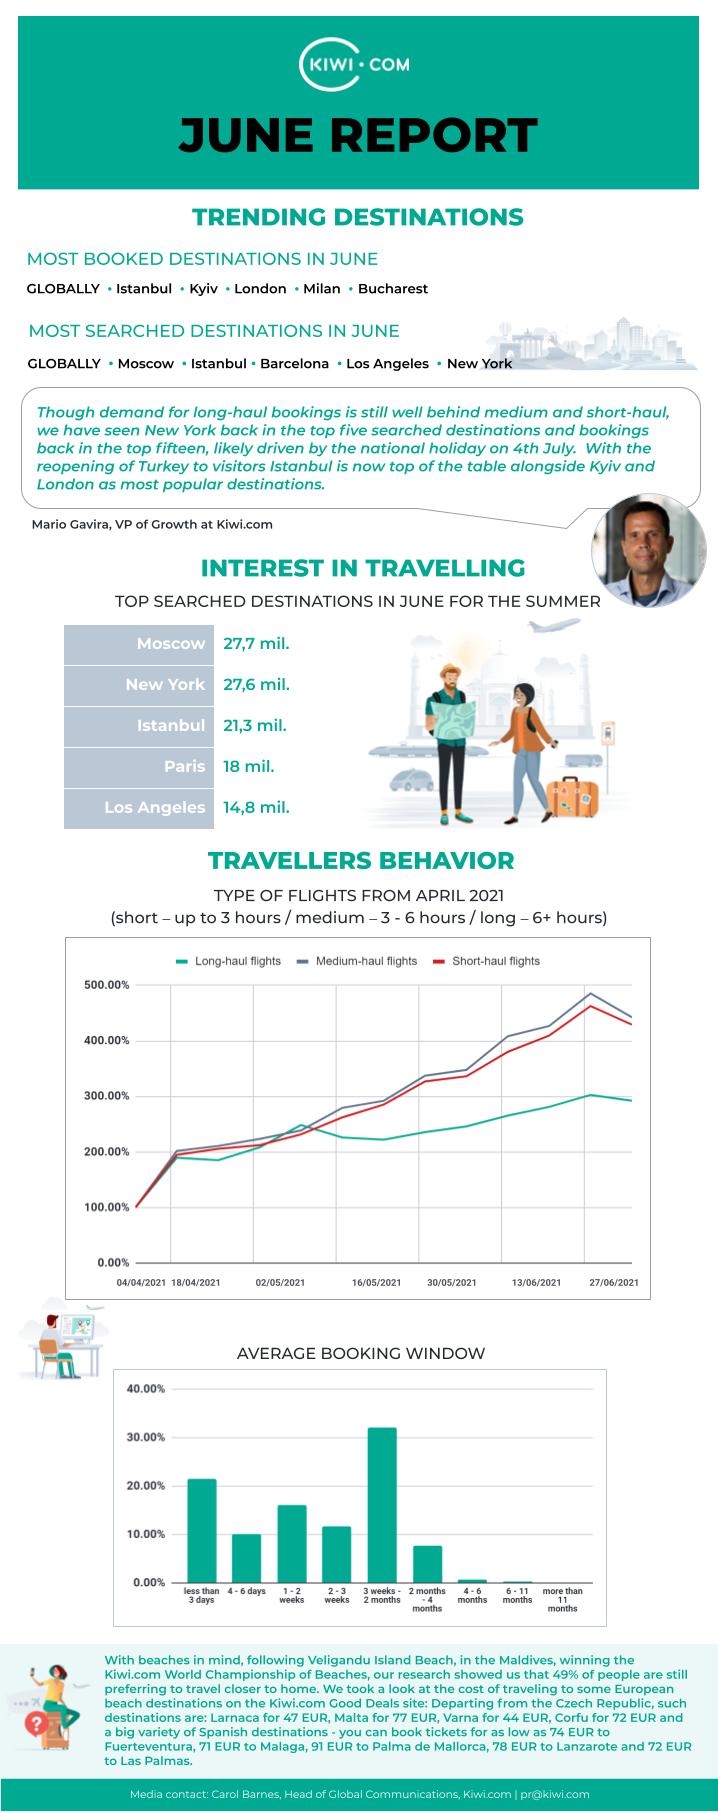 Kiwi.com travel data June 2021